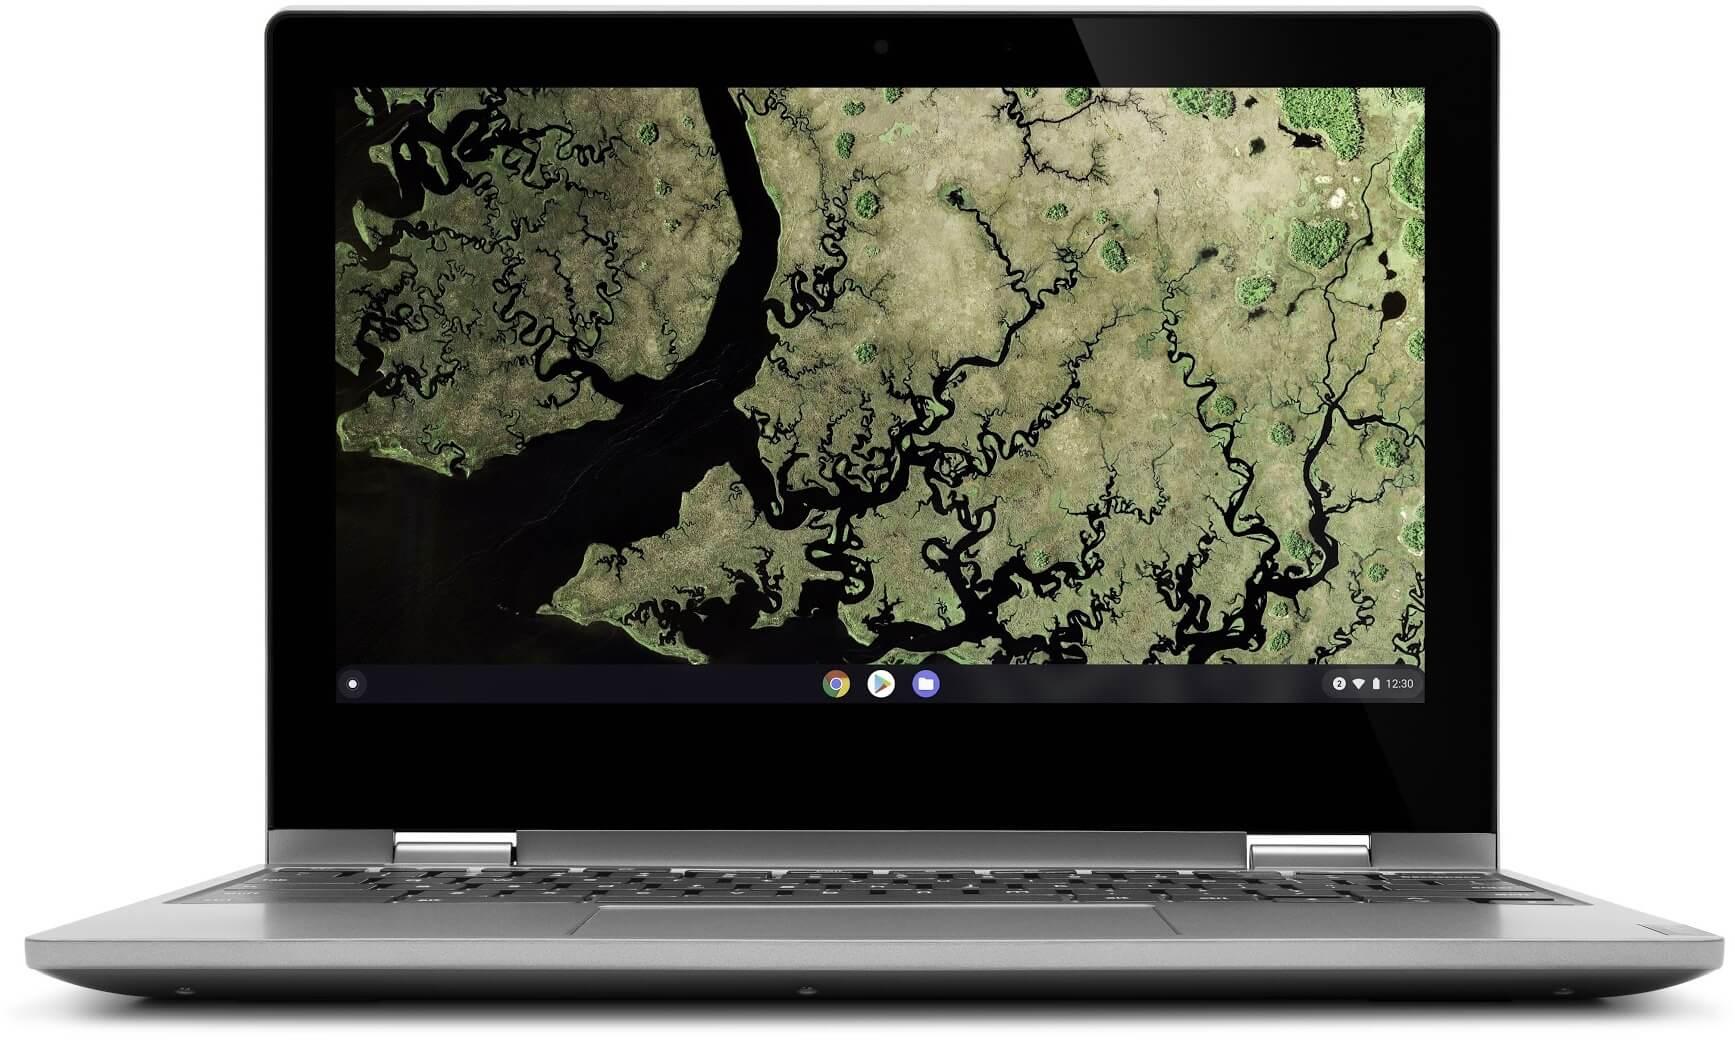 Chromebook (C340-11) photo 1